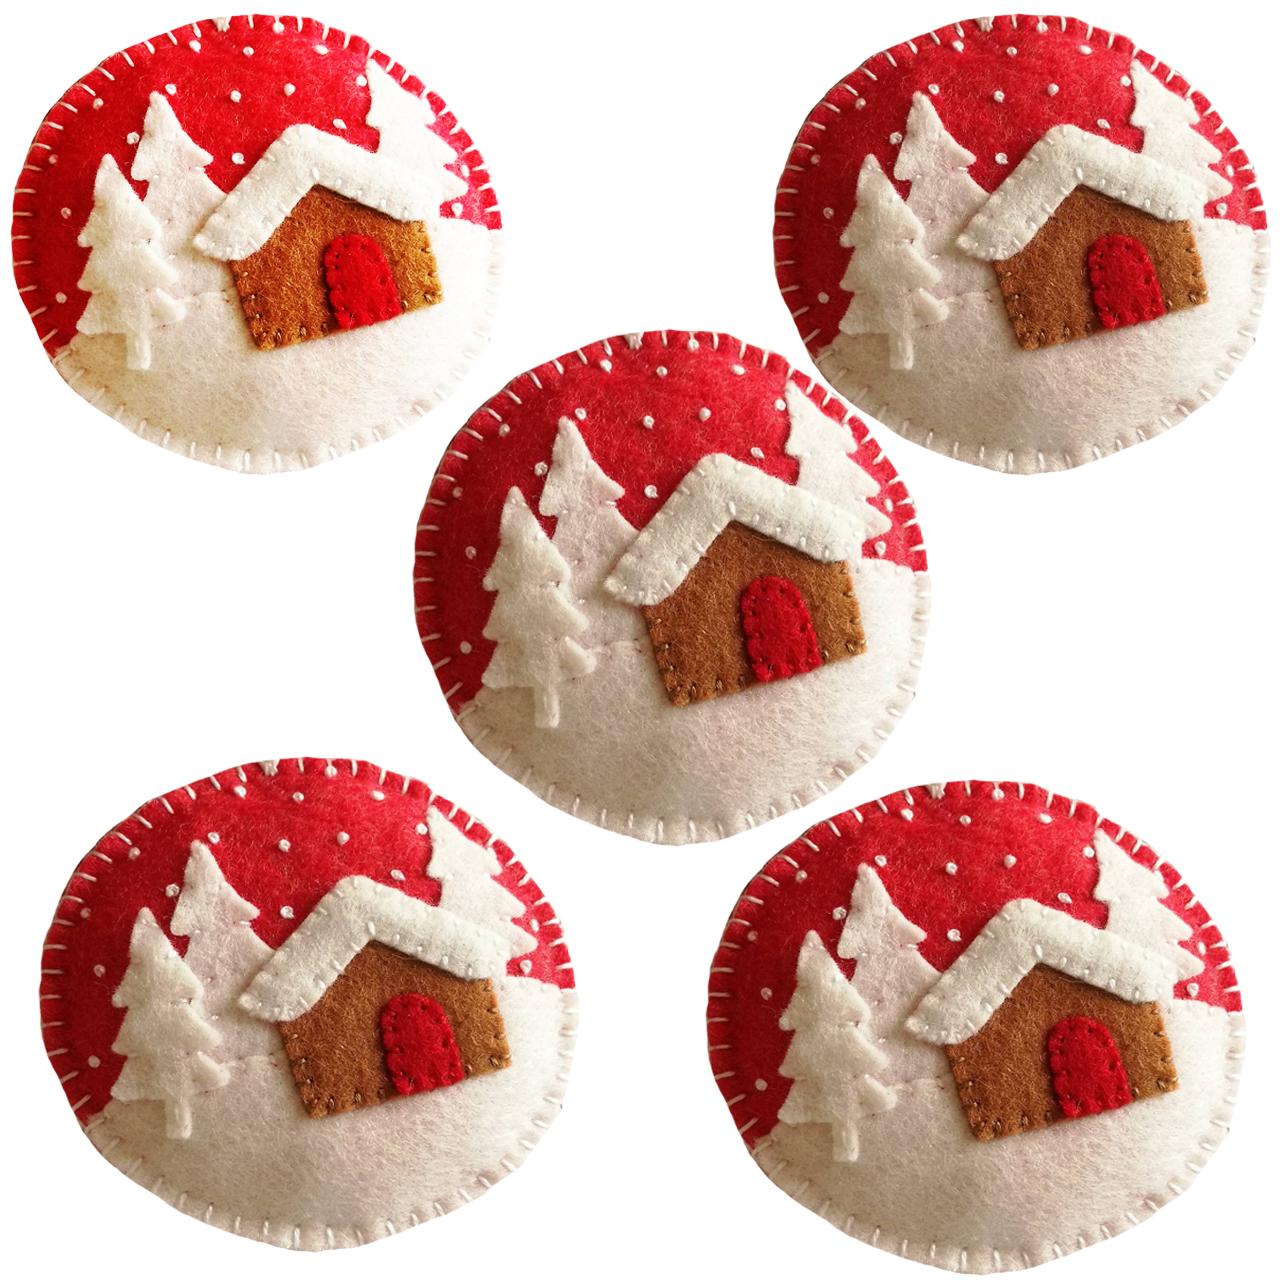 آویز درخت کریسمس هیاهو مدل سنت دی بسته 5 عددی